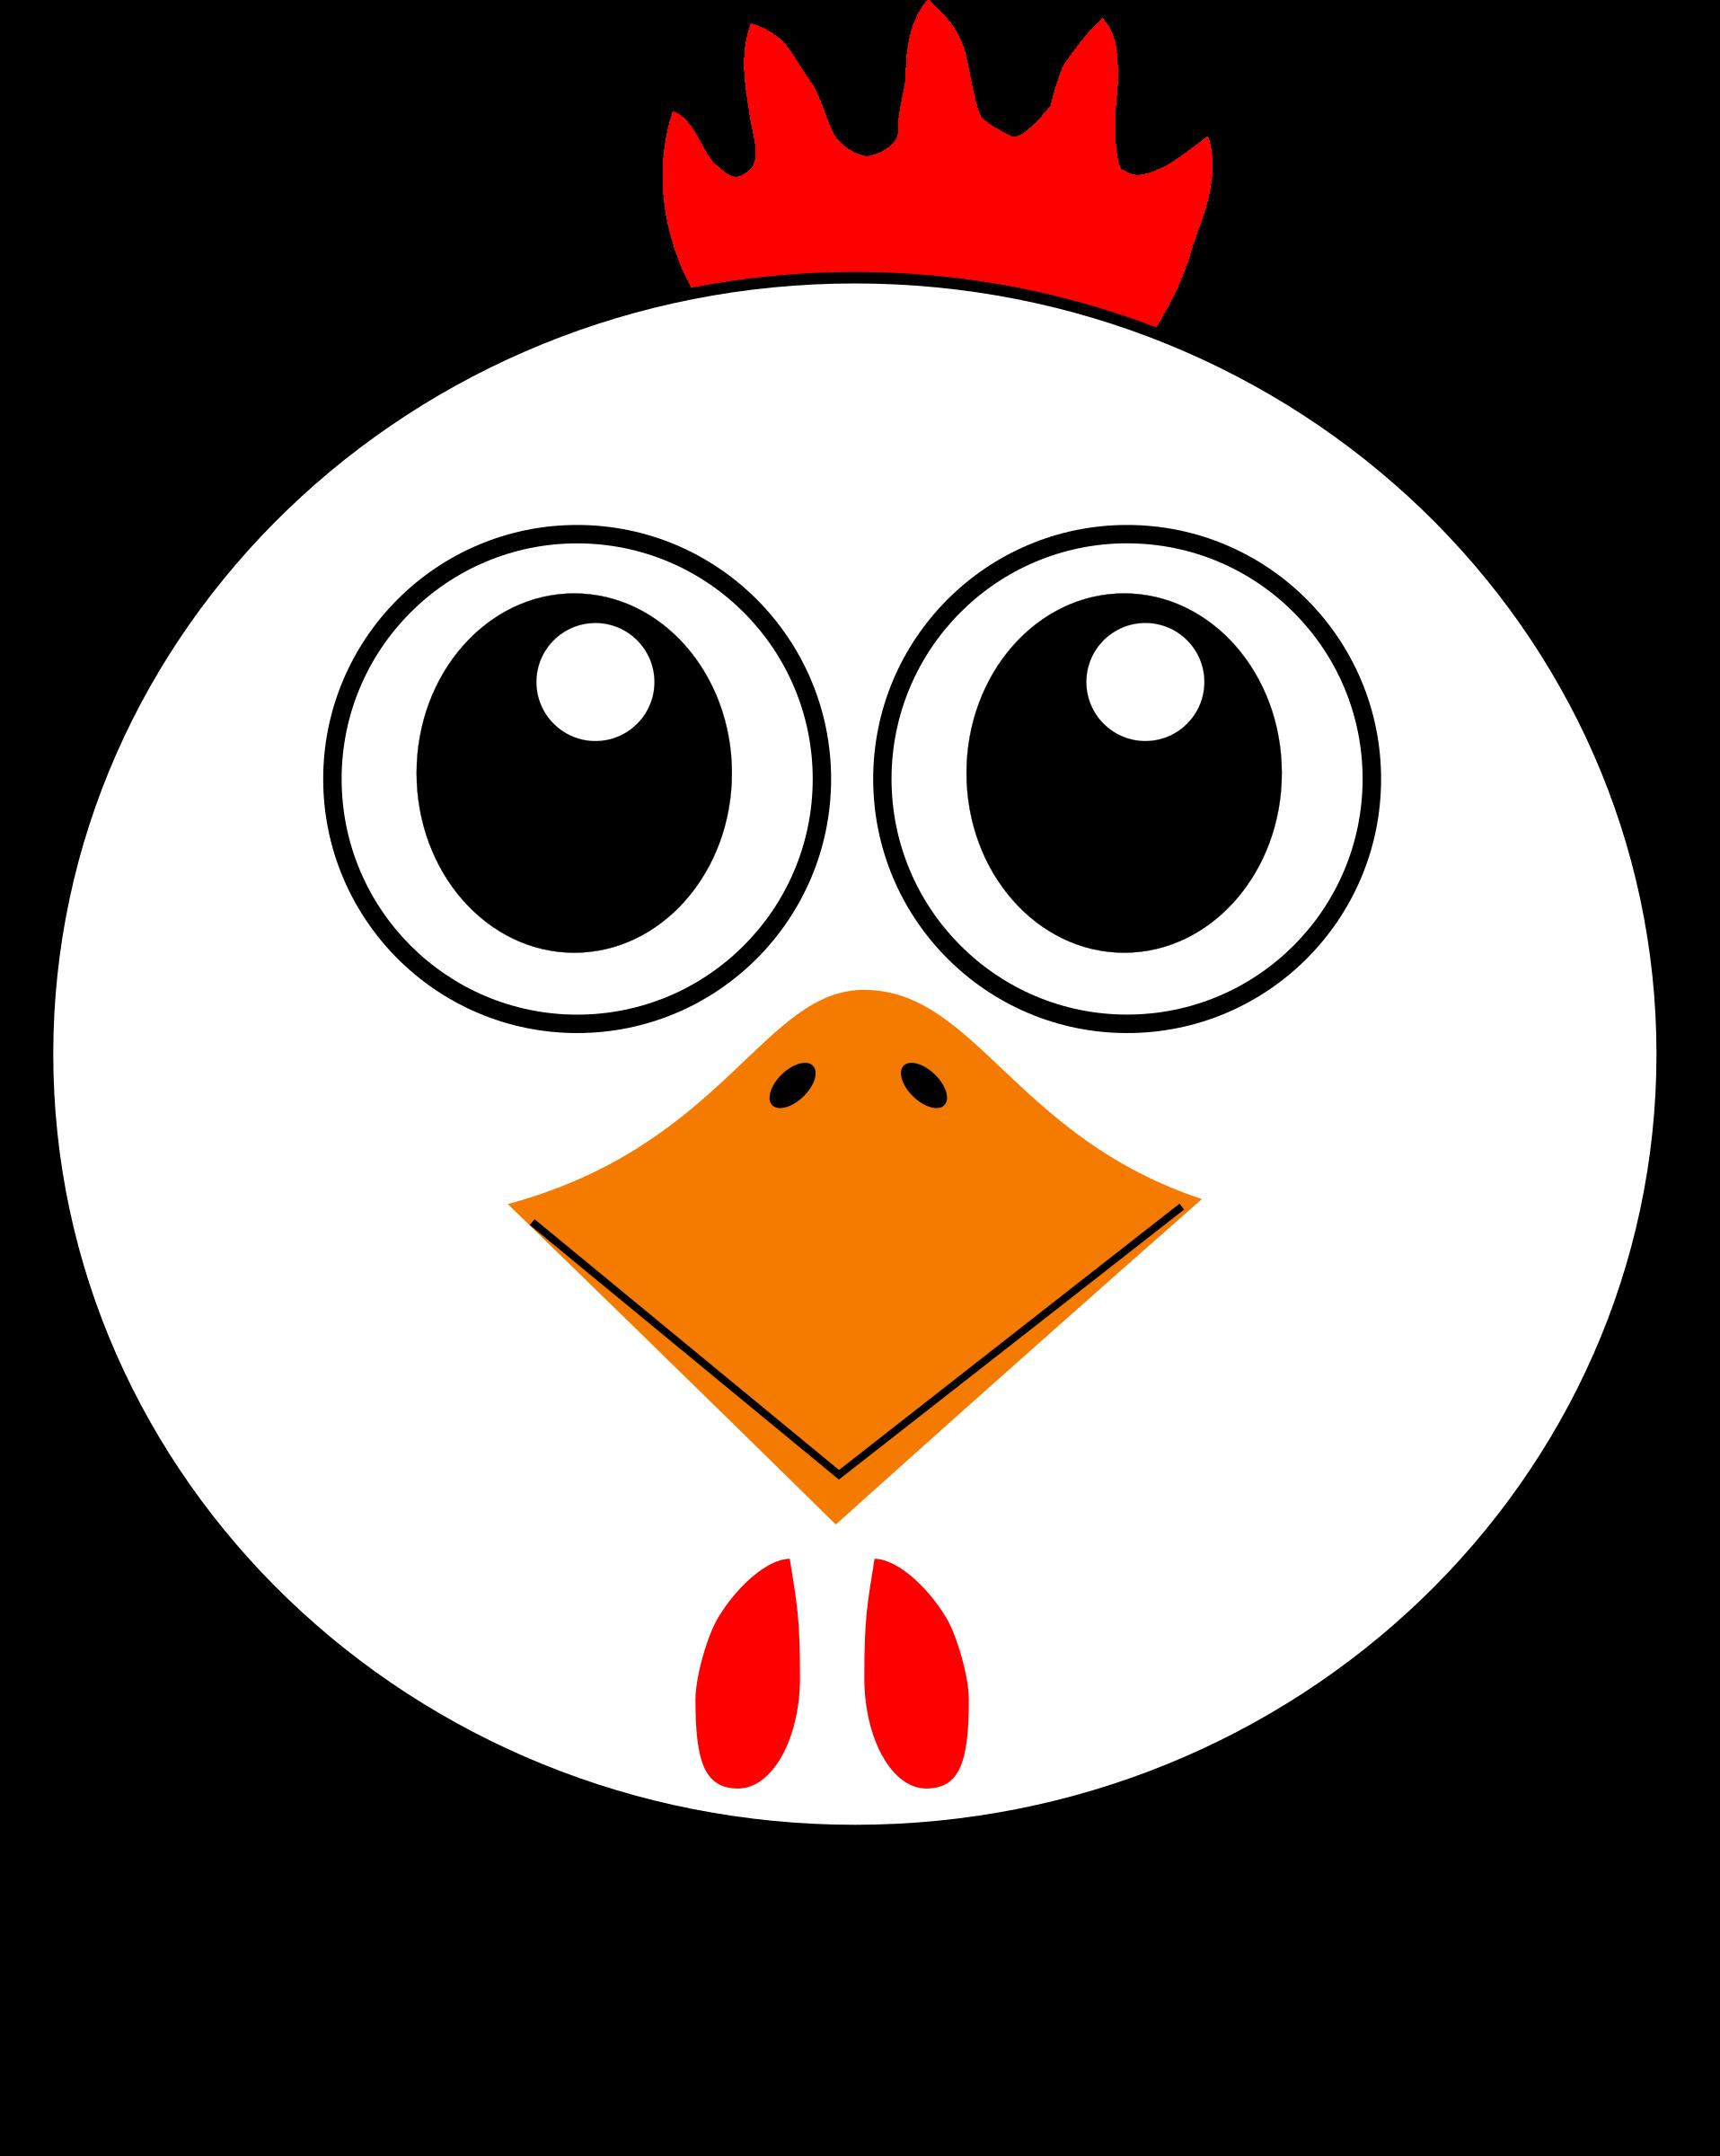 Clipart face big bird. Funny chicken cartoon image